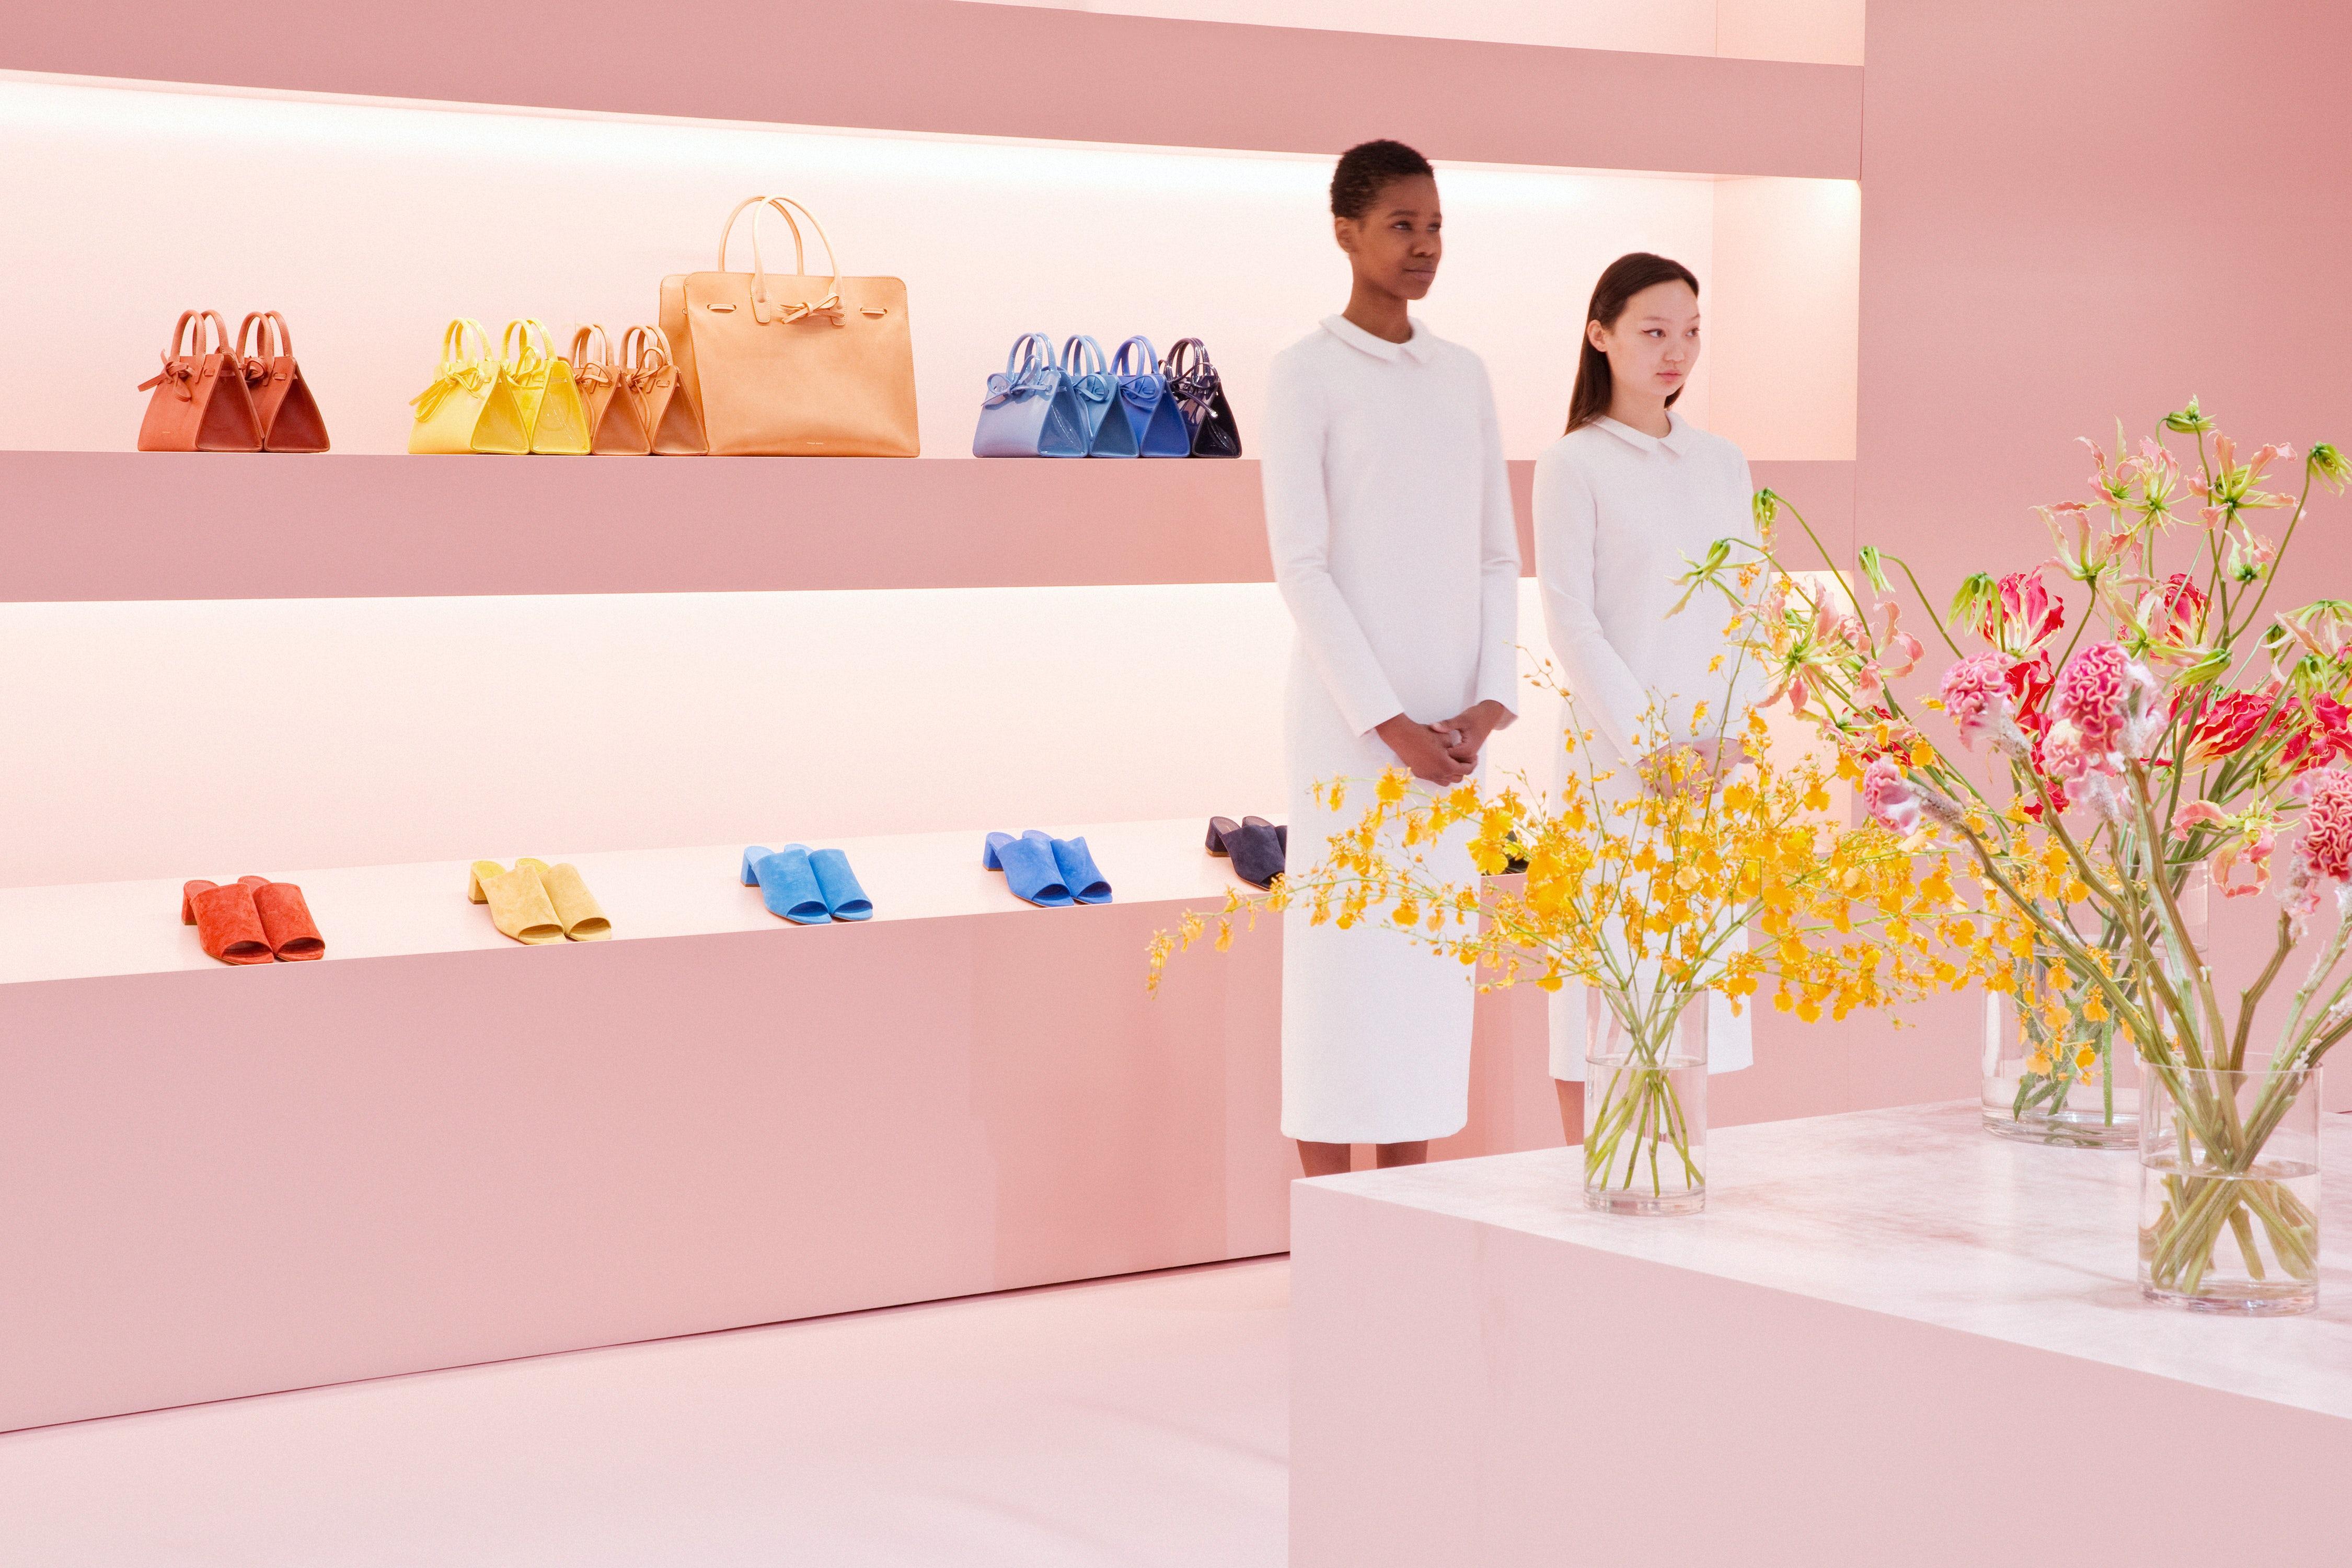 Mansur Gavriel's pop-up retail space in New York's SoHo | Source: Courtesy